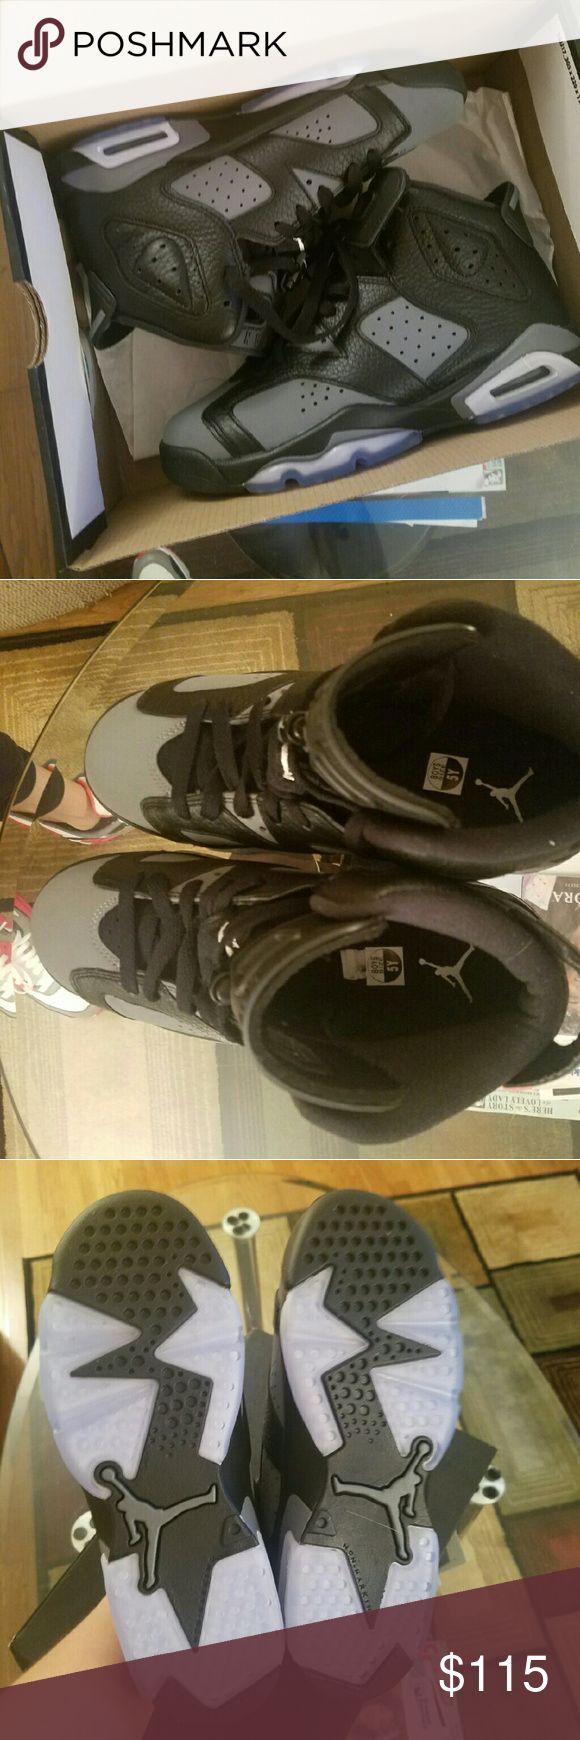 Kids Jordans retro 6's Brand new in box never worn Jordan Shoes Sneakers